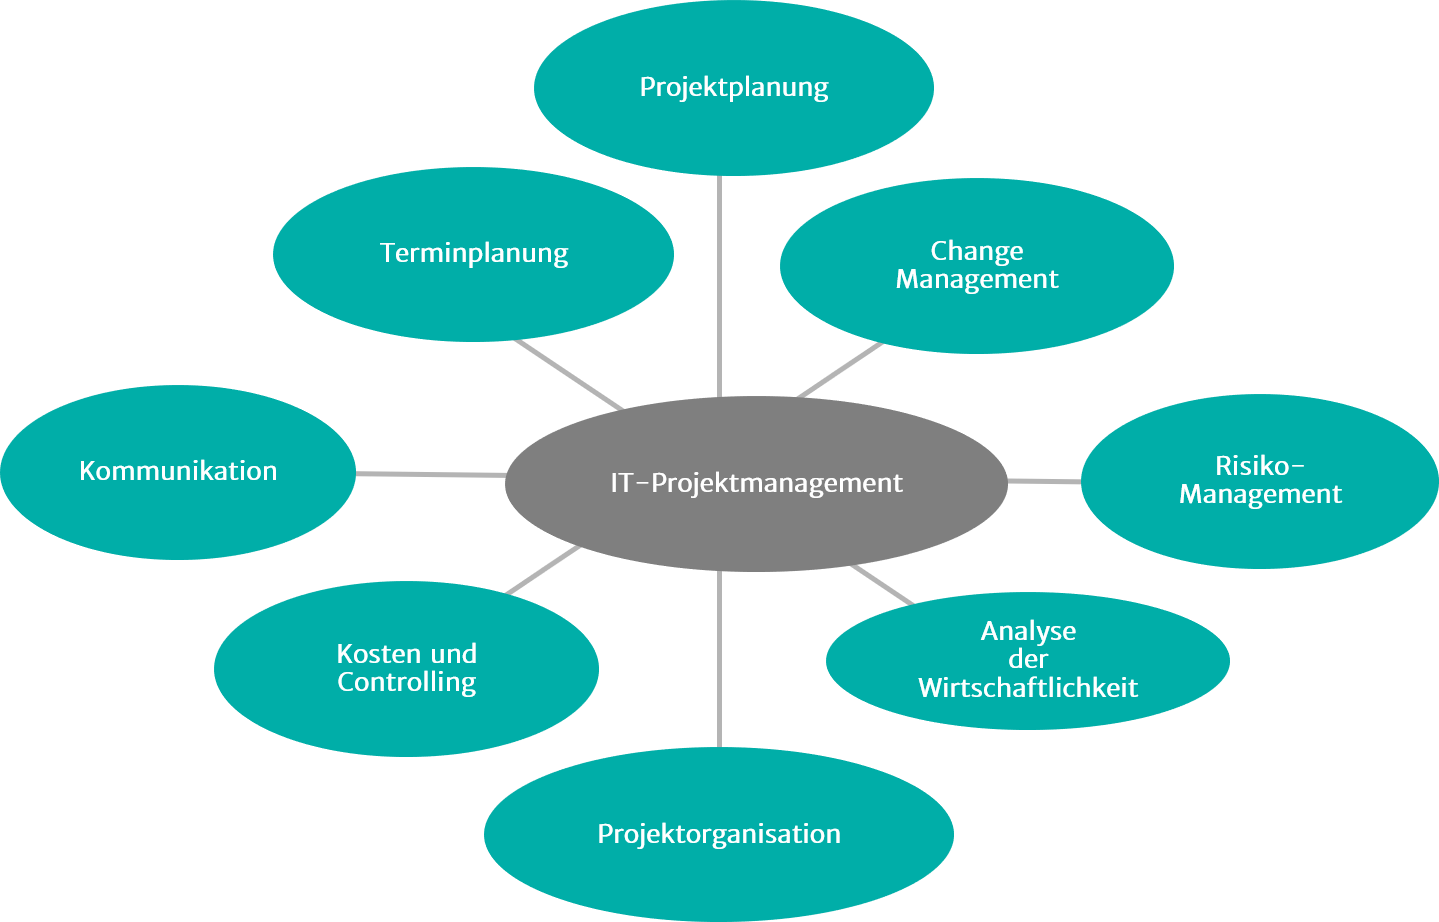 Illustration zu IT-Projektmanagement